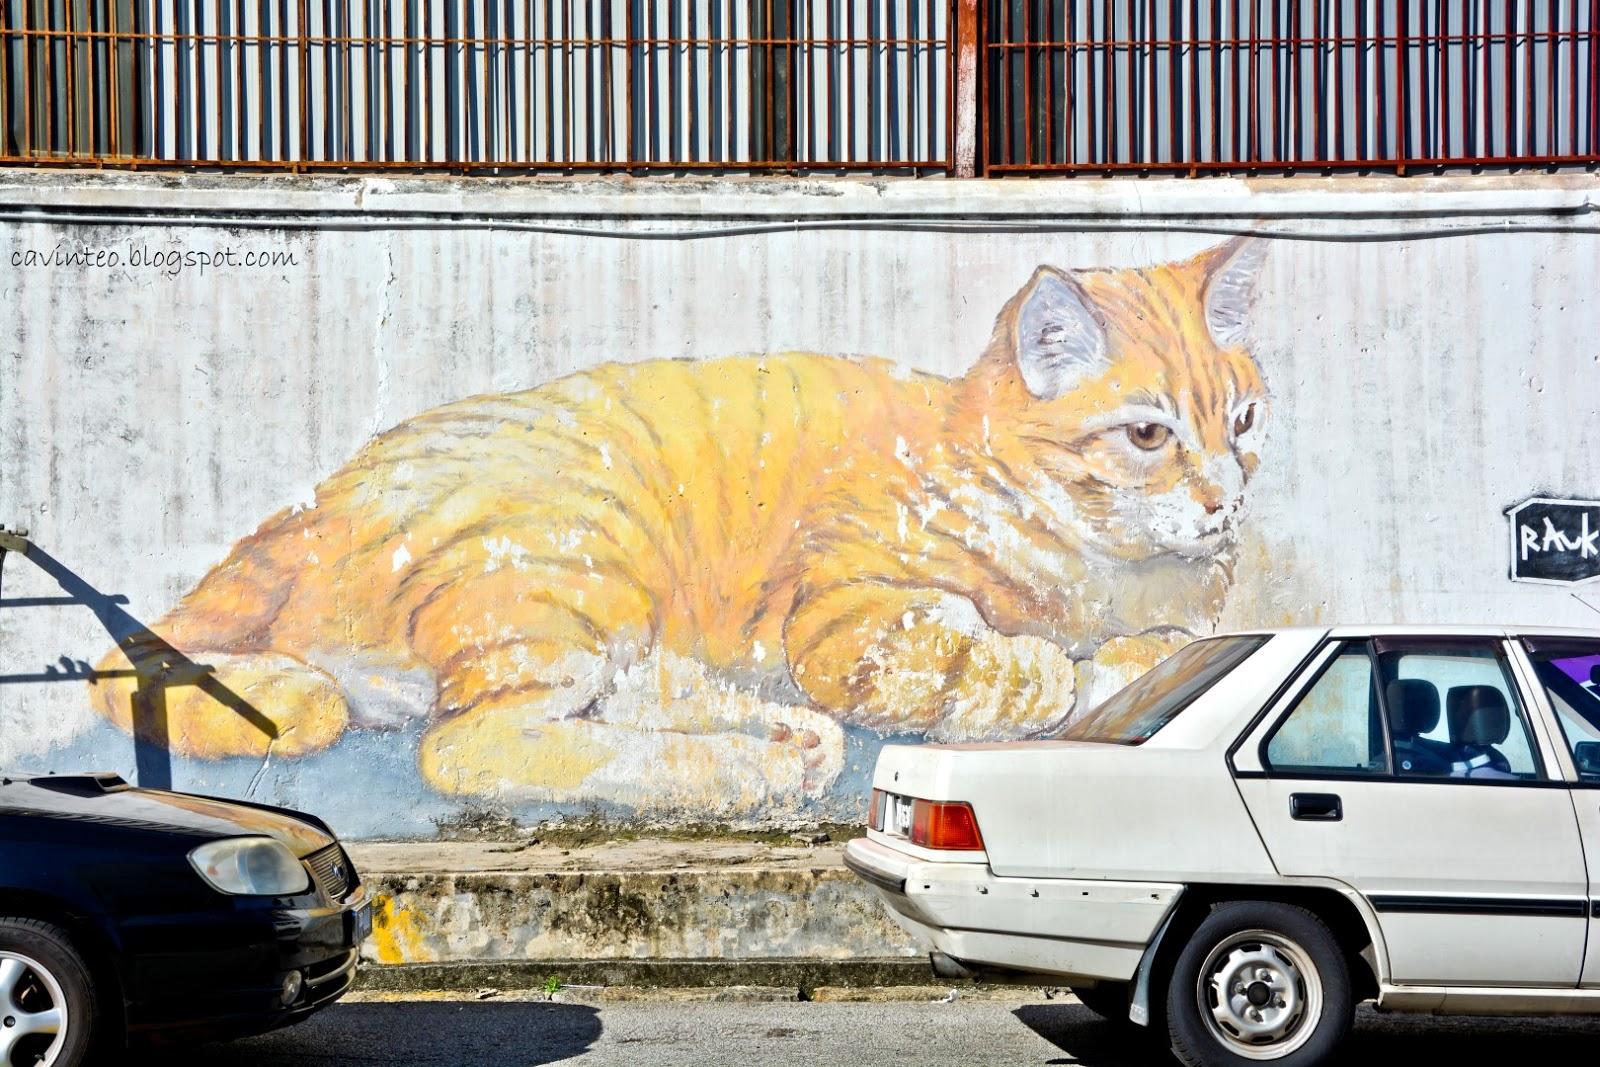 Entree kibbles along lebuh armenian towards chew jetty for Mural 1 malaysia negaraku